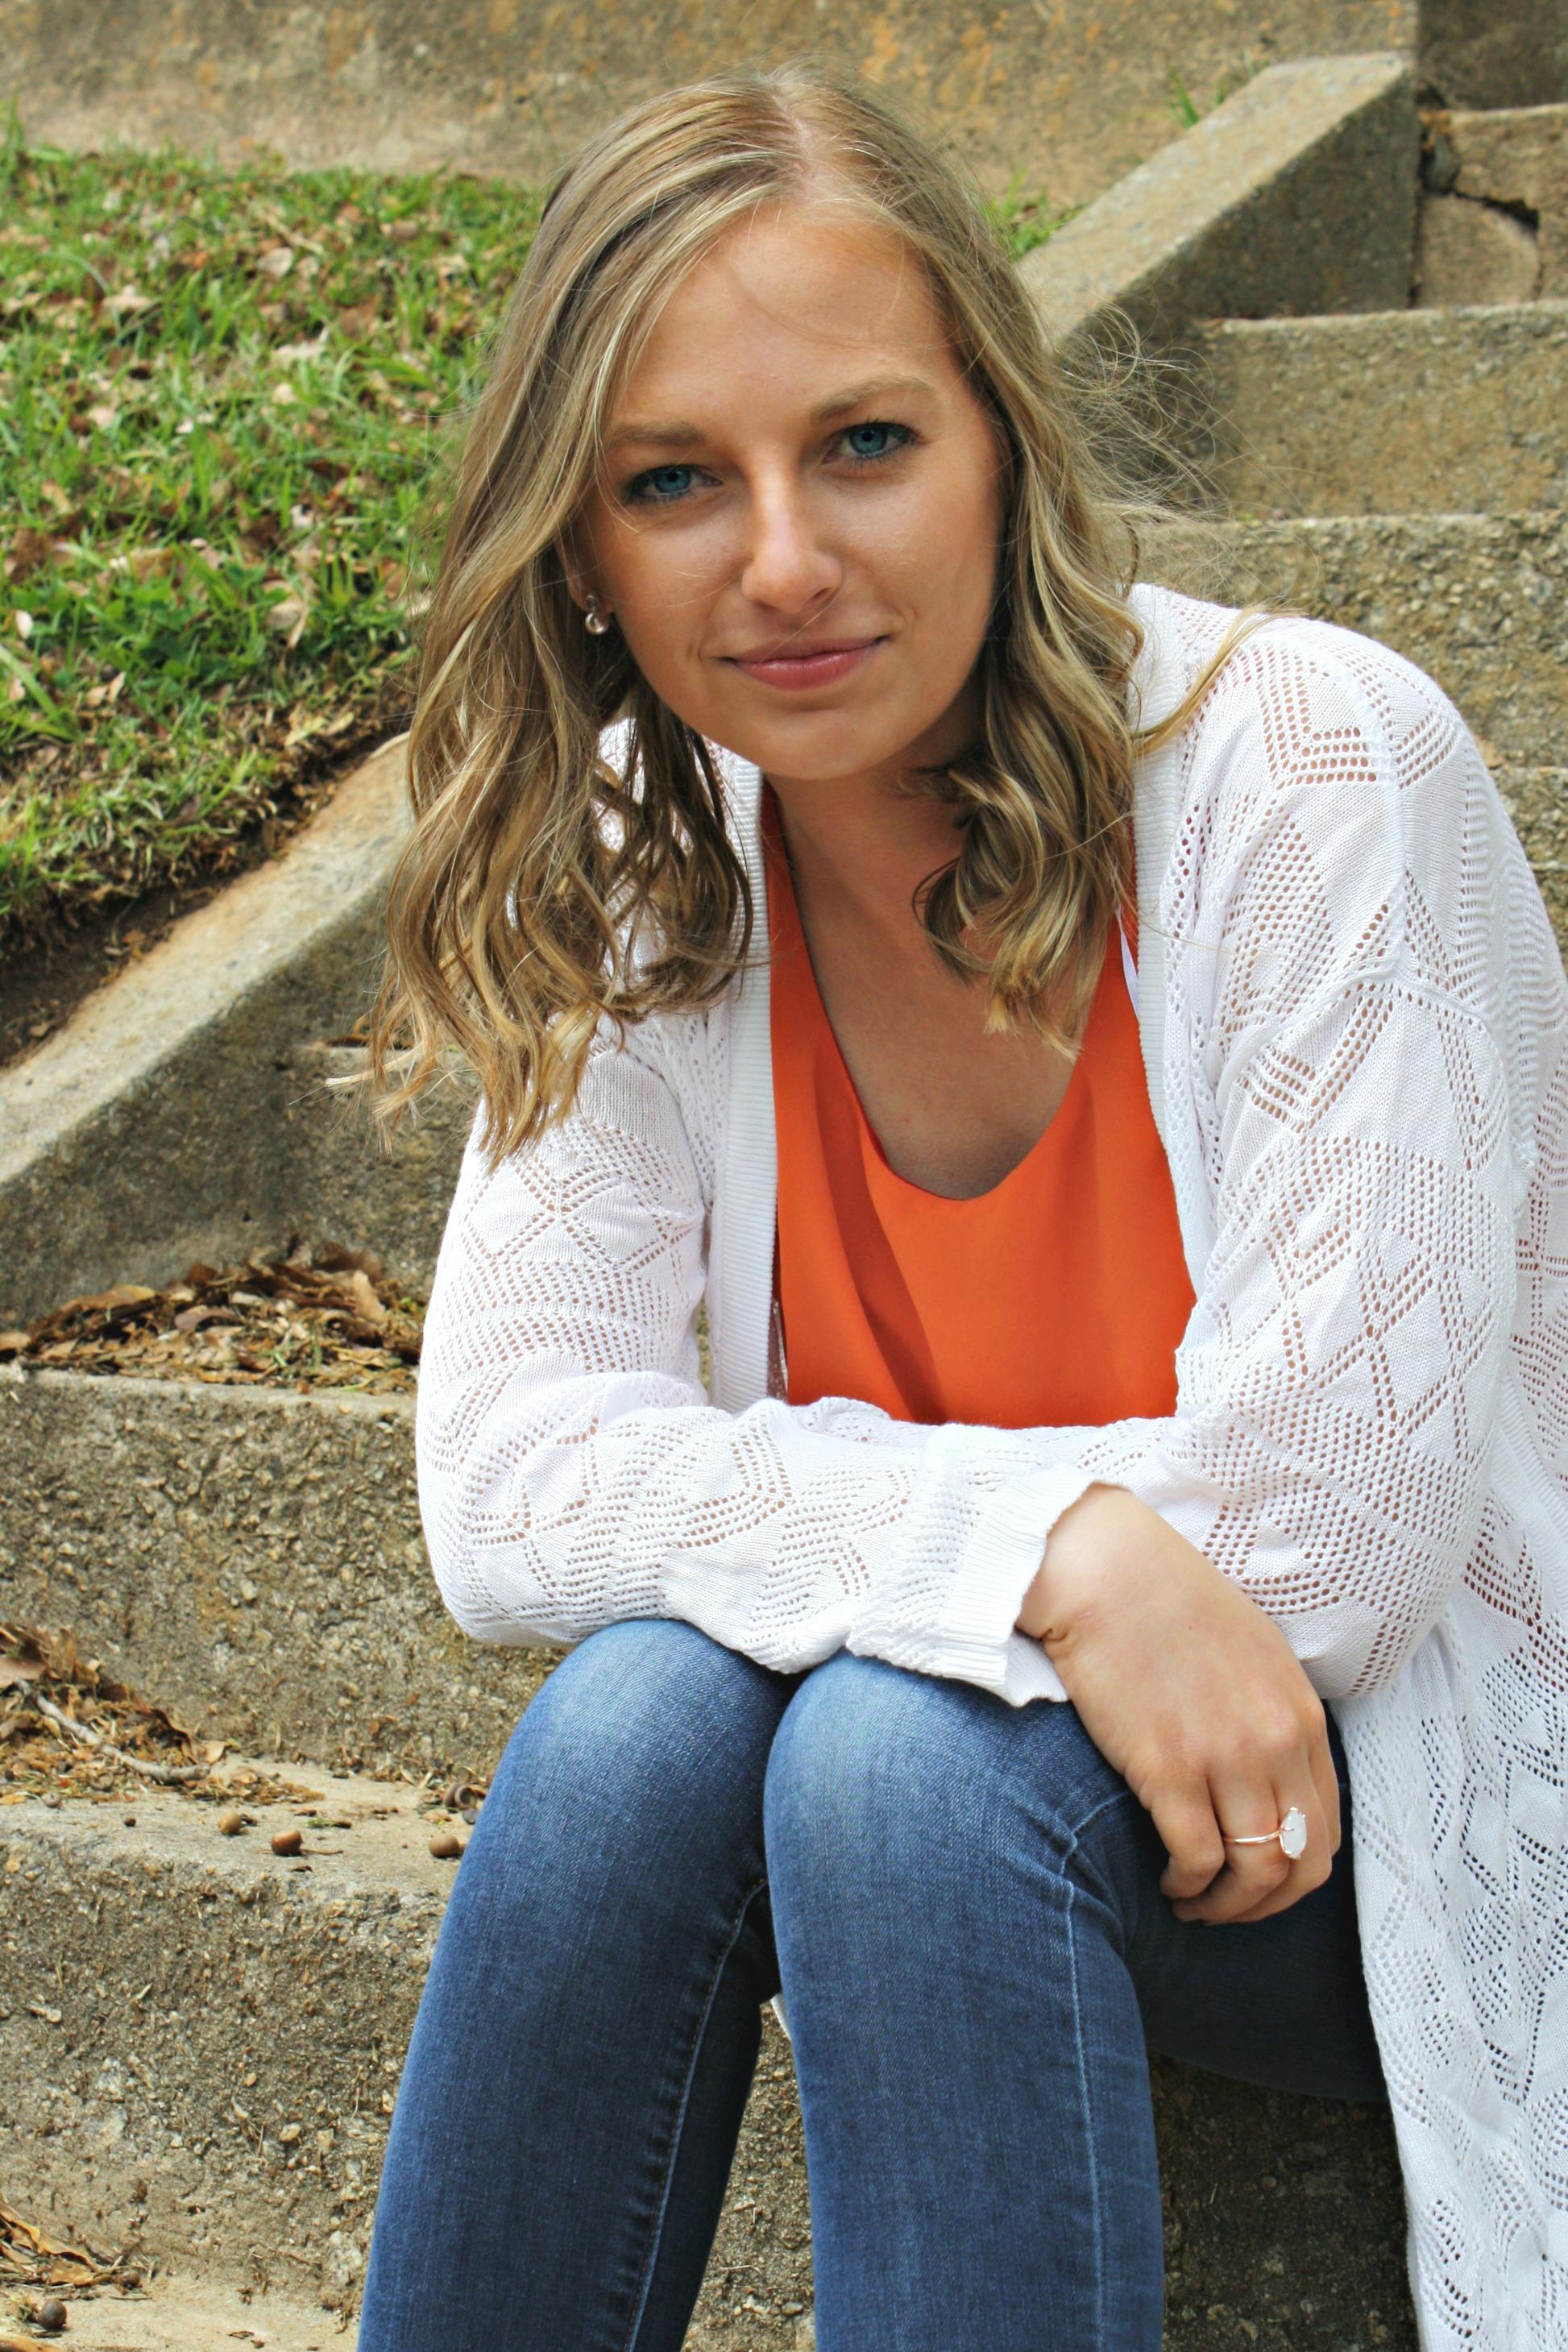 Sydney Rayne Hewitt, artist and winner of the 2018 scholarship